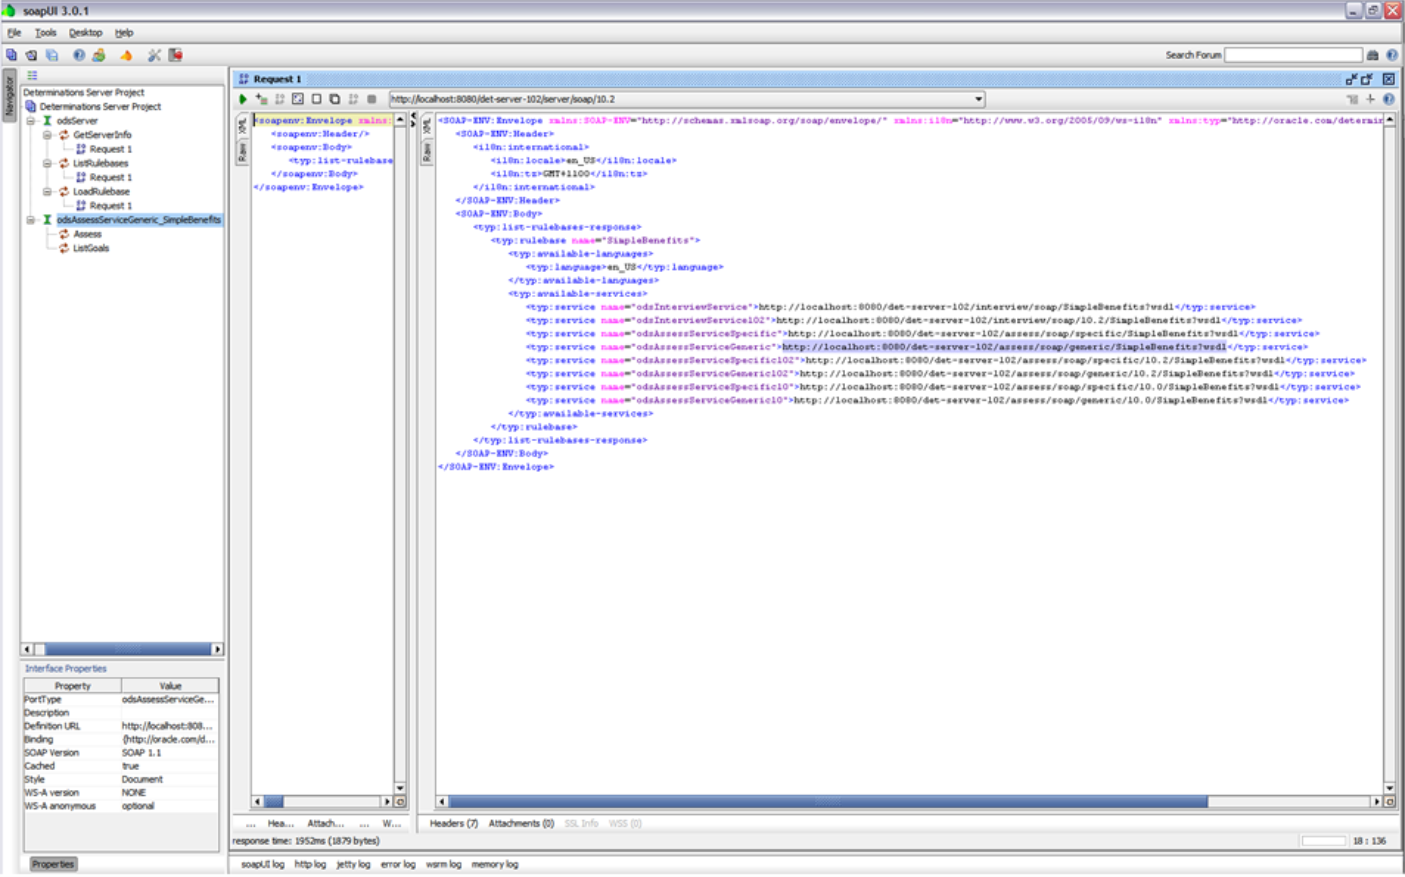 Test a rulebase using a web service